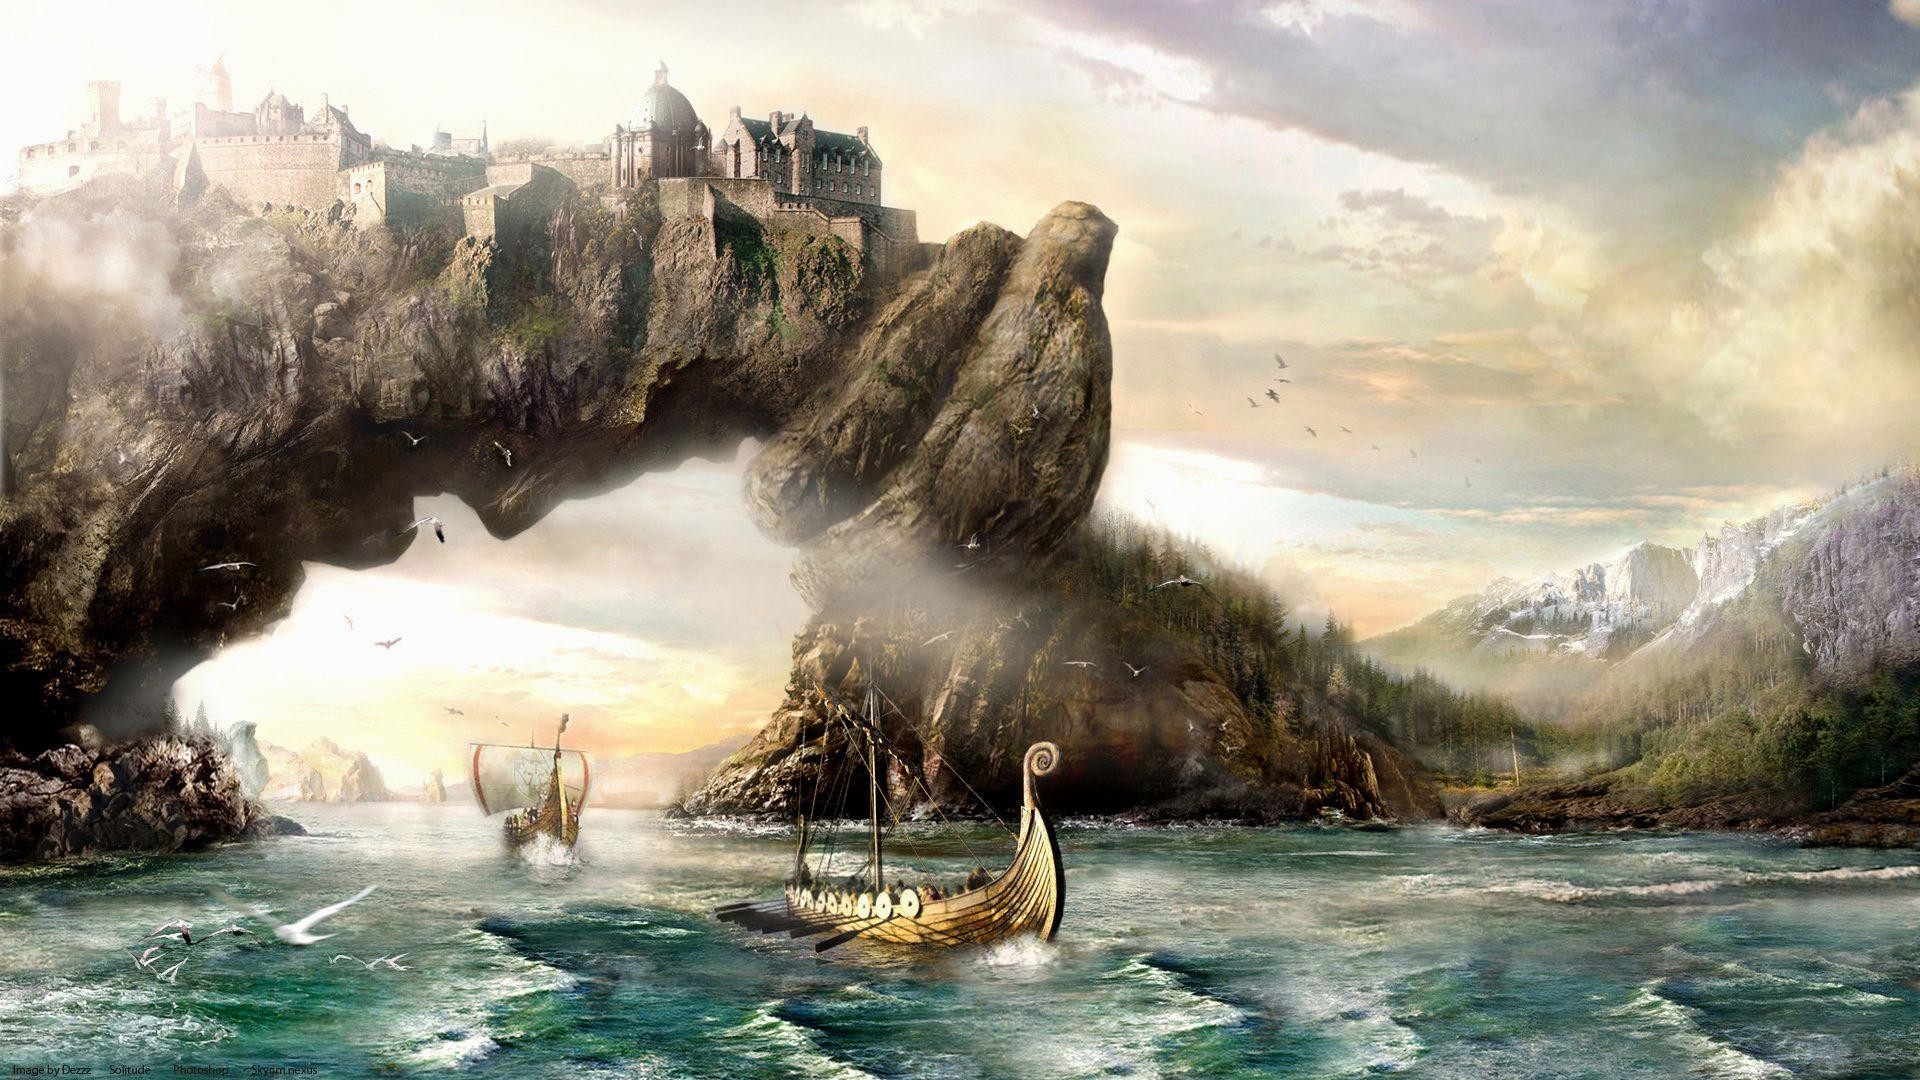 wallpaper.wiki-Viking-HD-Wallpapers-PIC-WPE00366